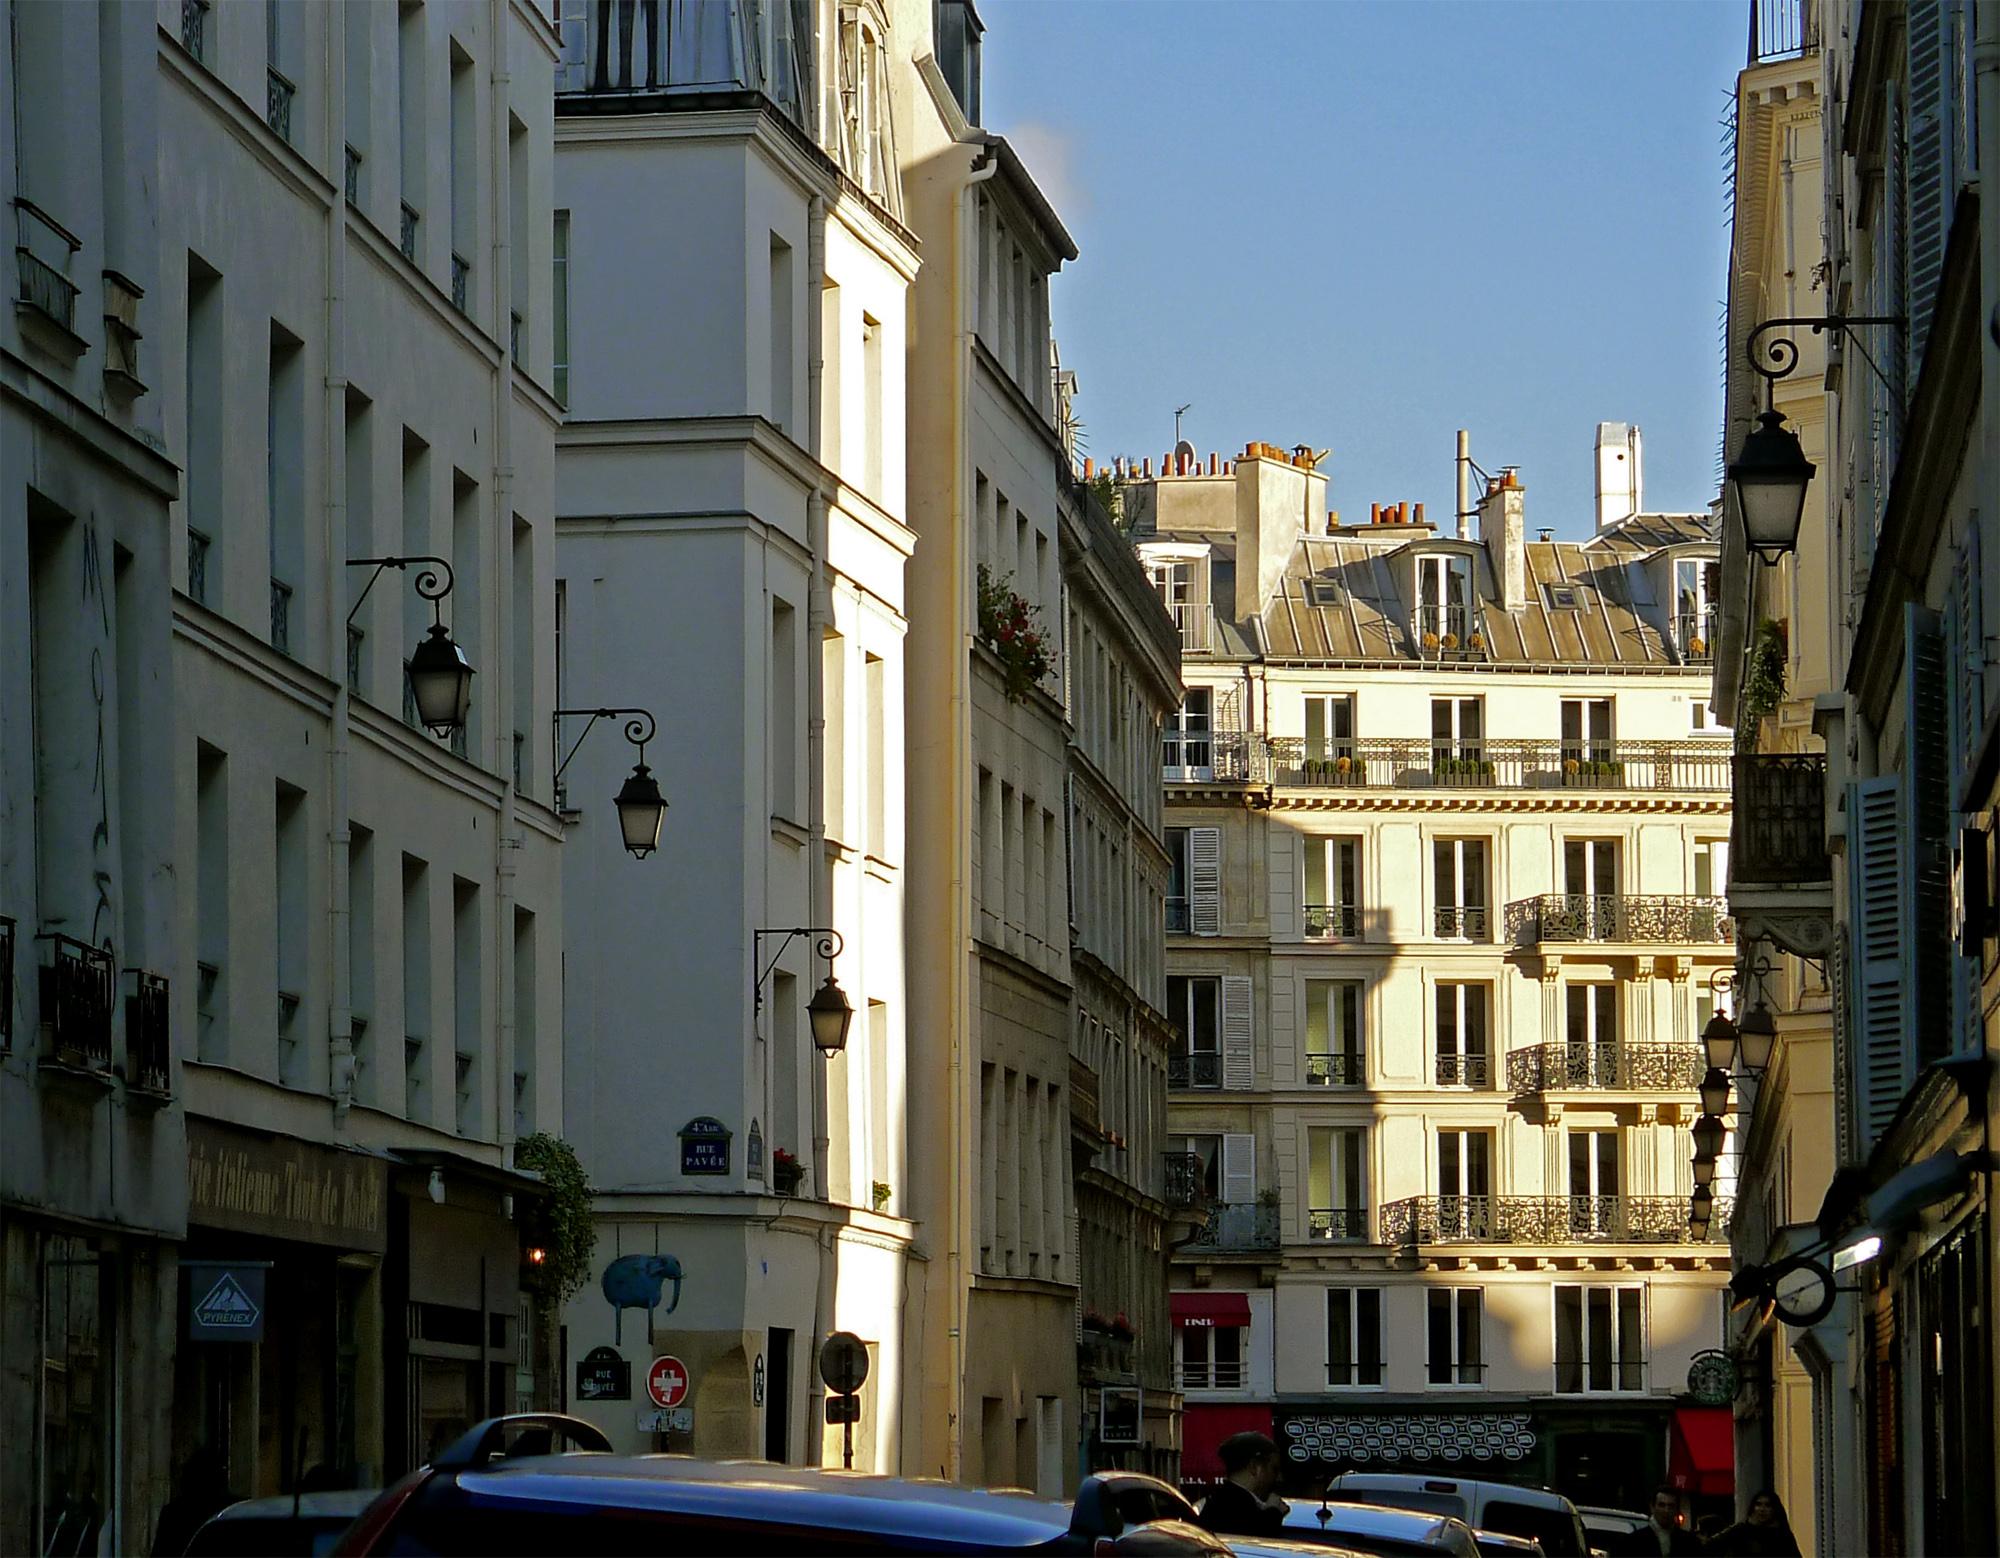 File:P1140571 Paris IV rue du Roi-de-Sicile rwk.jpg - Wikimedia Commons